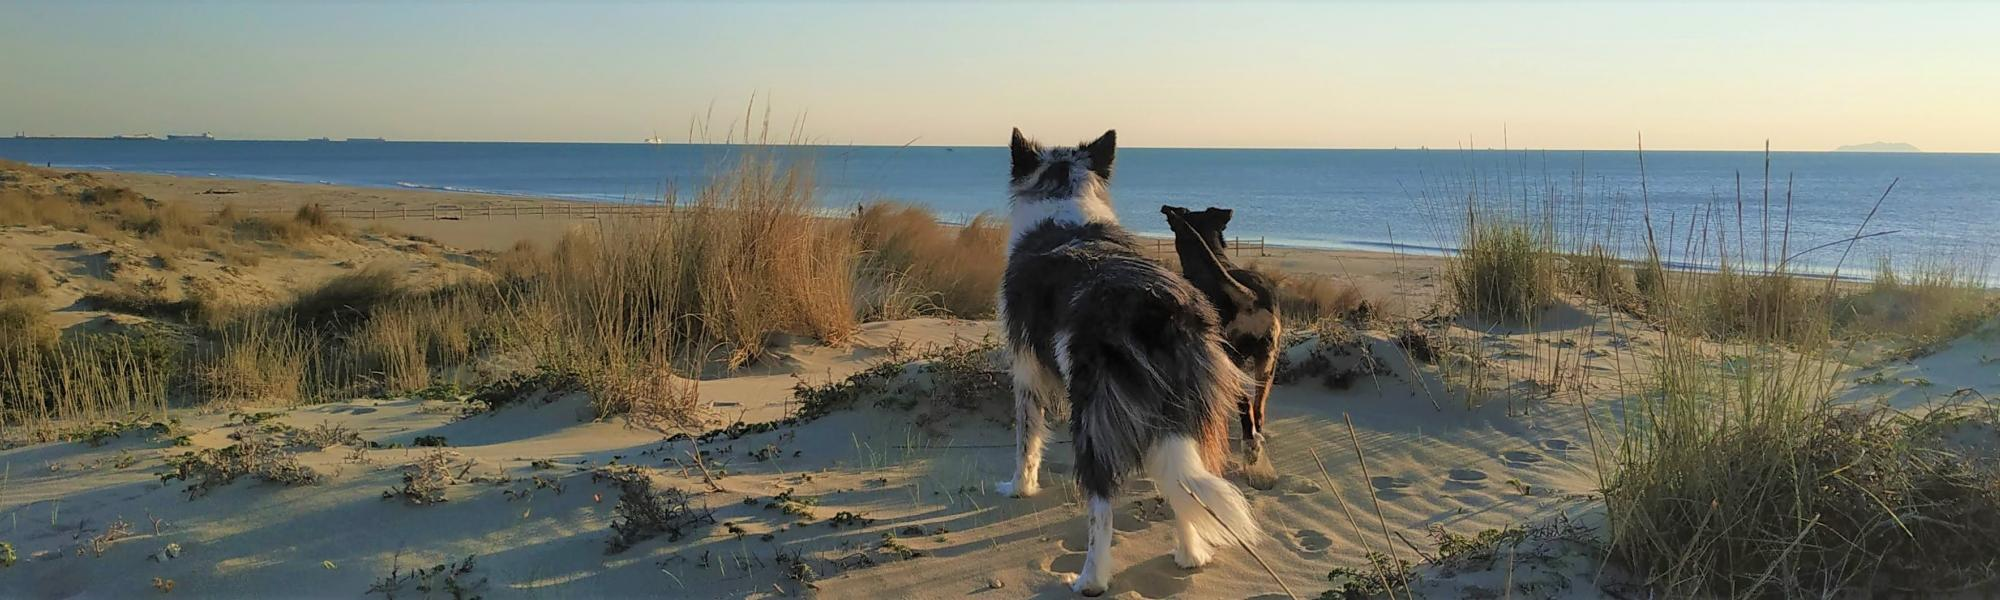 Spiaggia libera per cani (L. Corevi, Comune di Pisa)